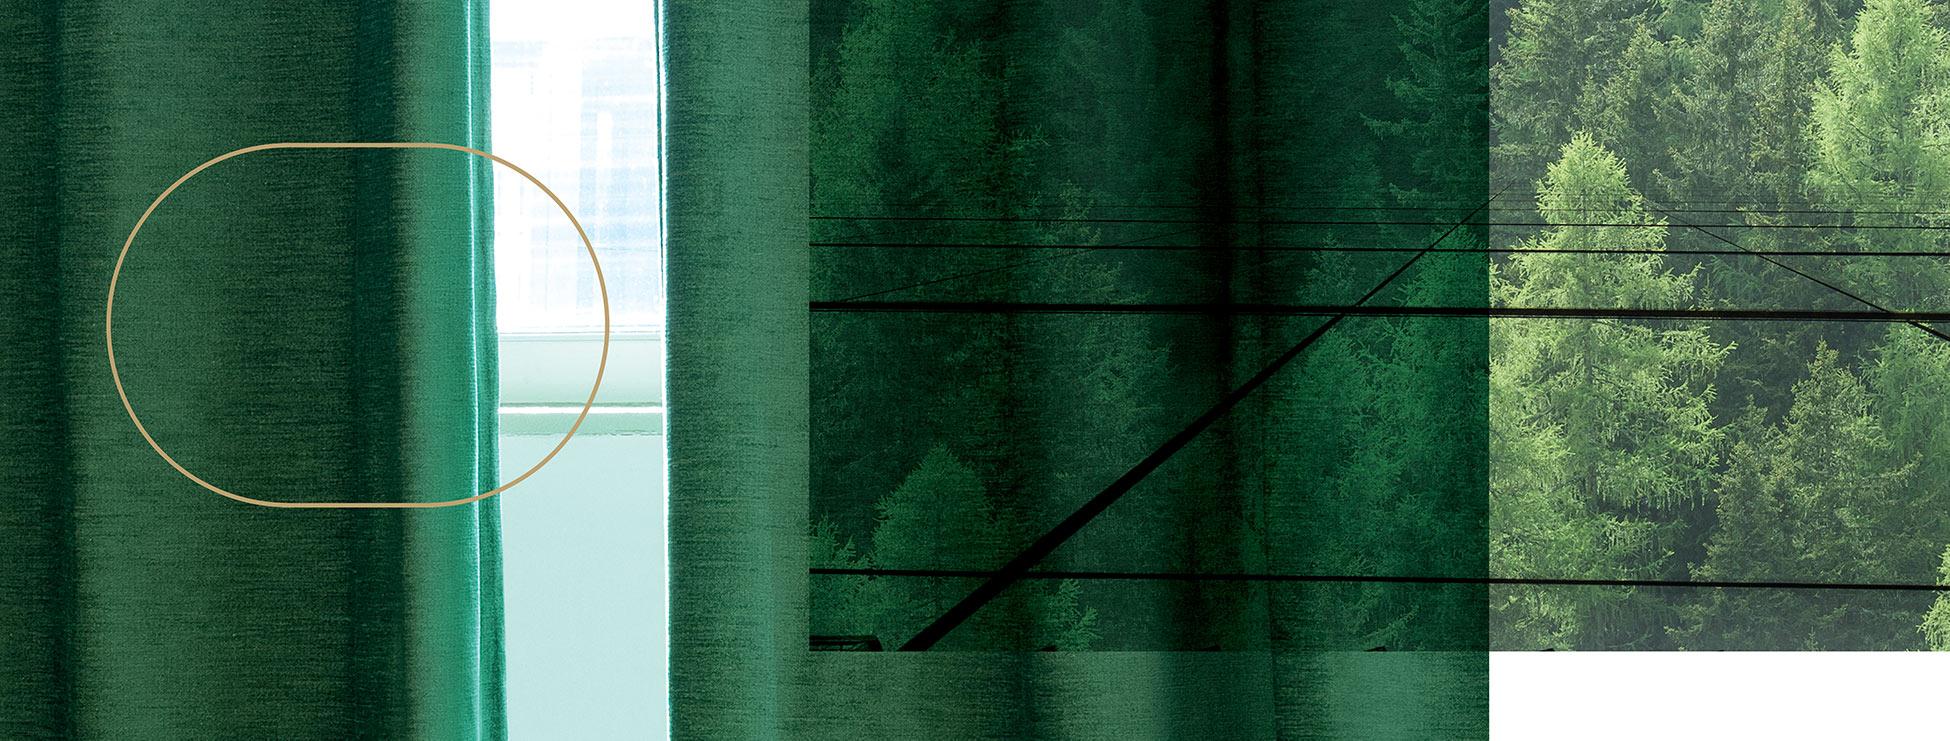 How LEED standards enhance eco-conscious interior plans